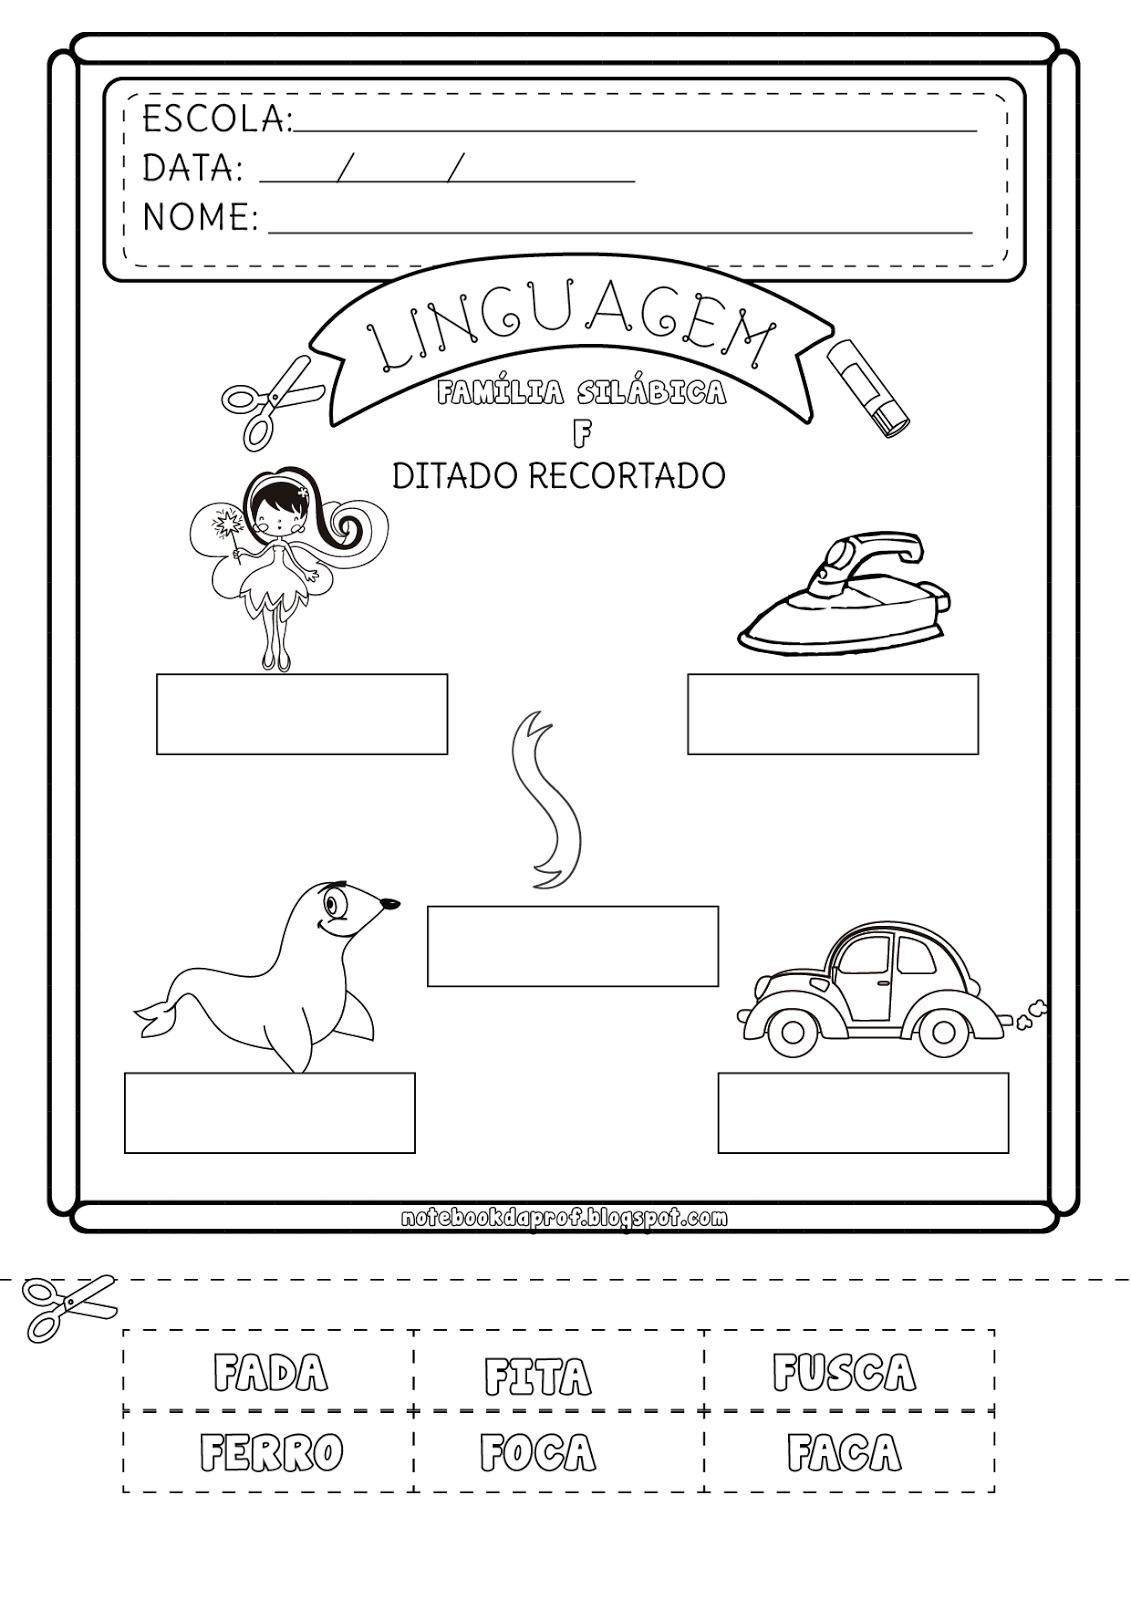 Notebook Da Profa Ditado Recortado Letra F